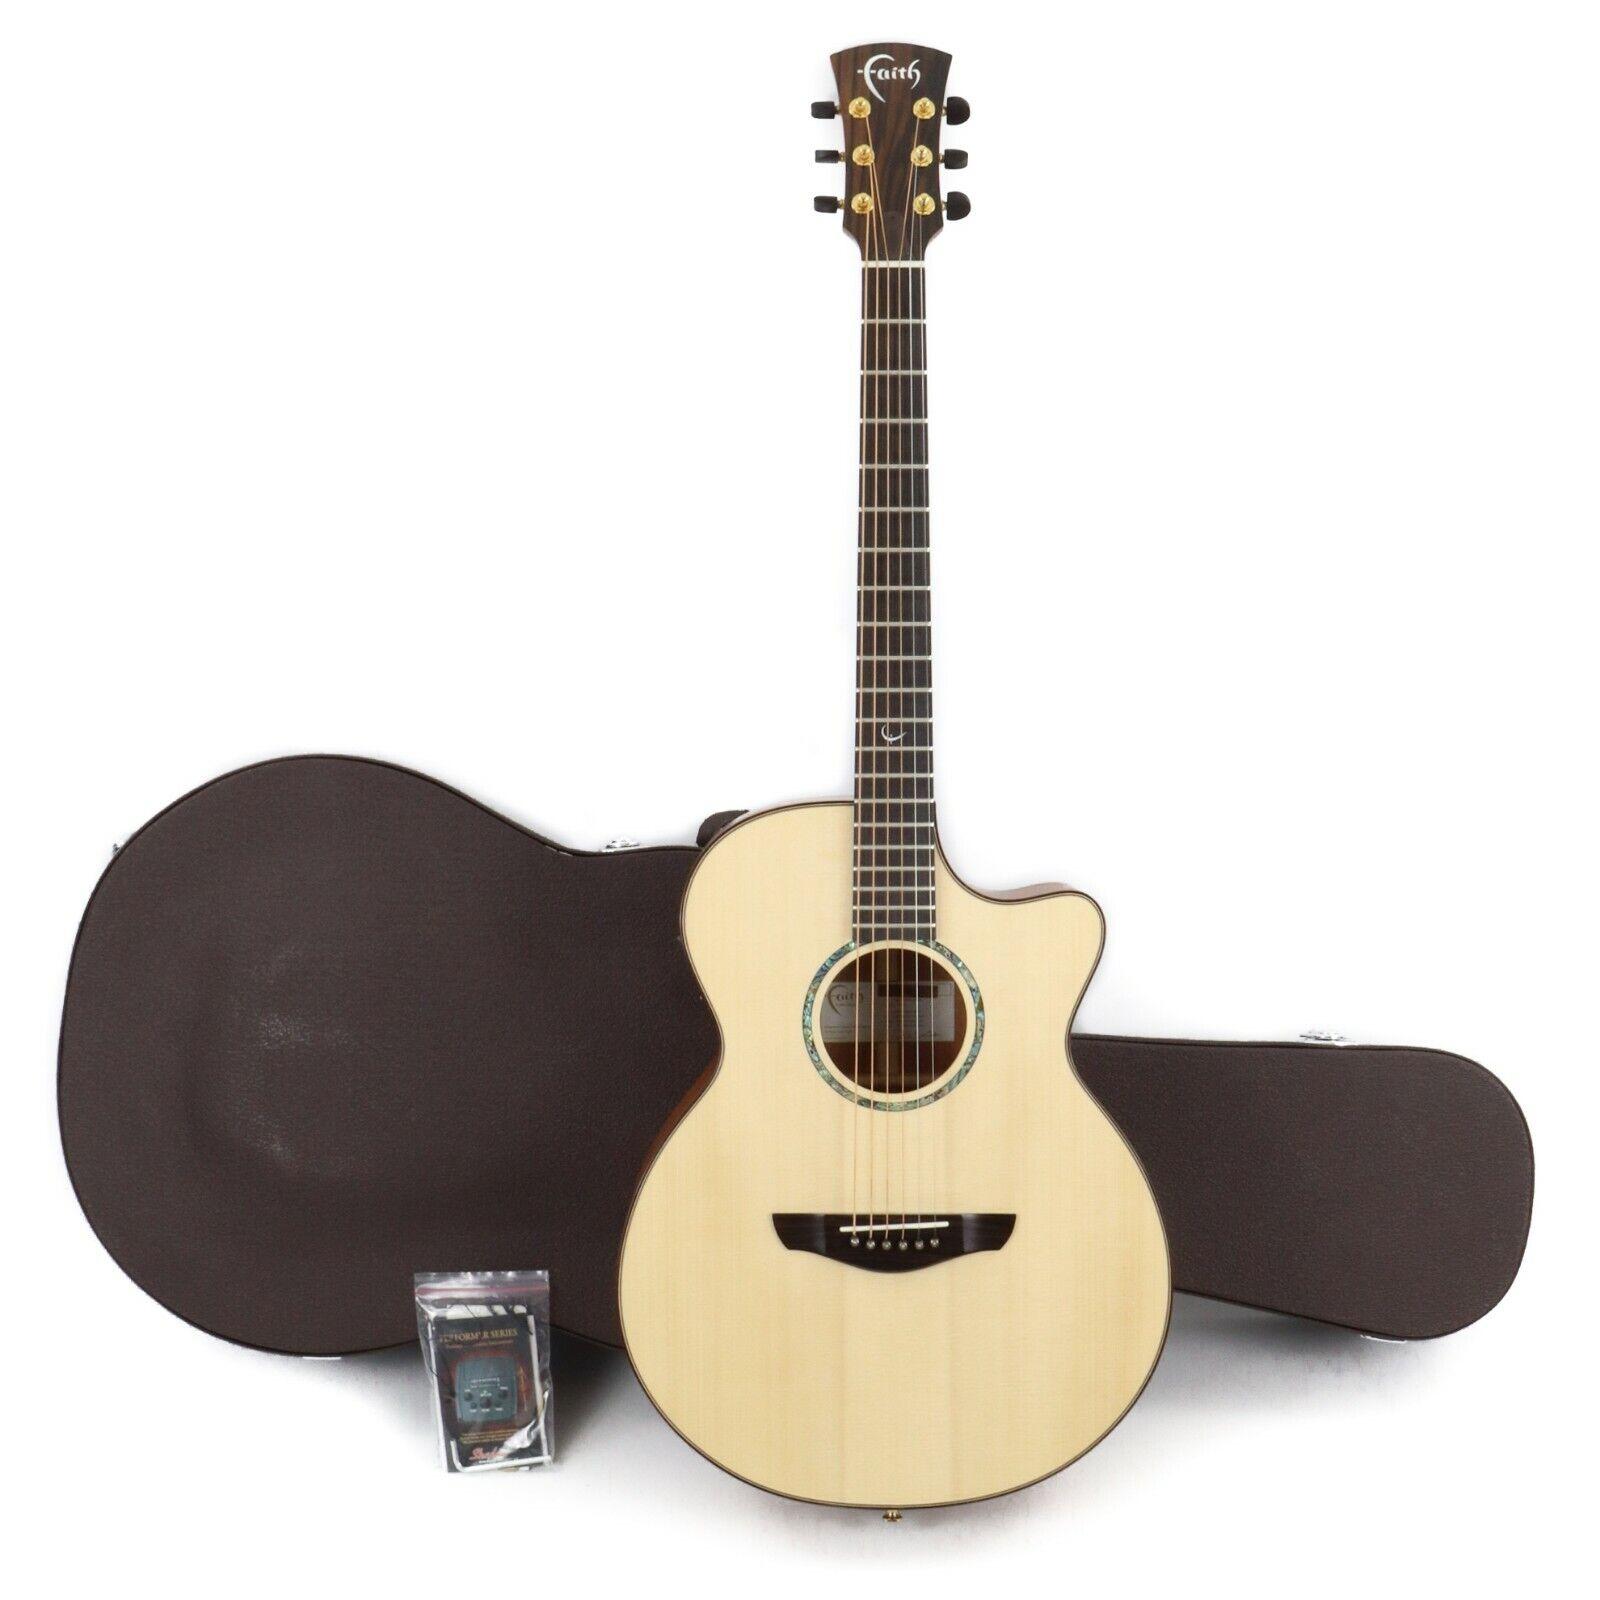 Faith FV Natural Venus Cutaway Electro Acoustic Guitar w  Case - natural